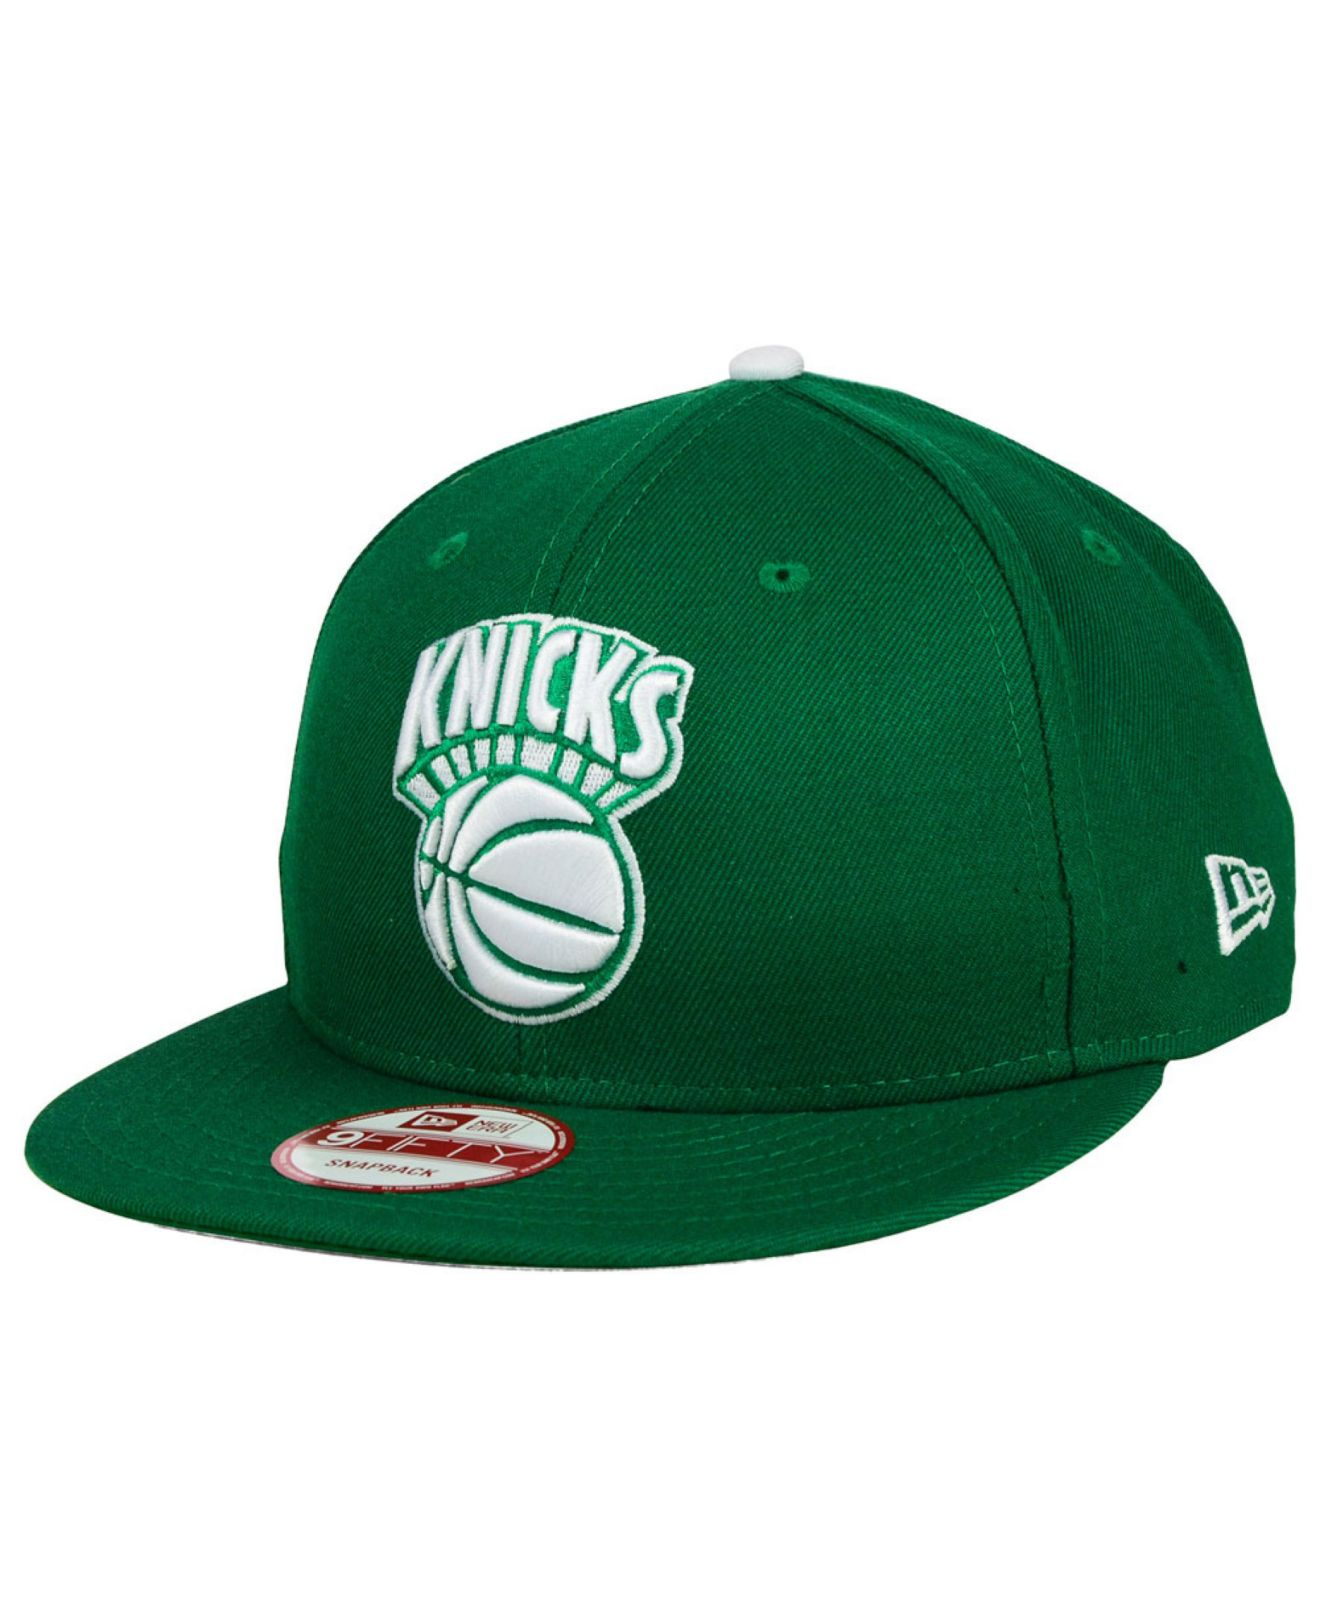 new product 8ff15 4d425 ... 59fifty cap fce0d 352d6 get lyst ktz new york knicks hwc st. pat 9fifty  snapback cap in green fa764 cheap new era ...